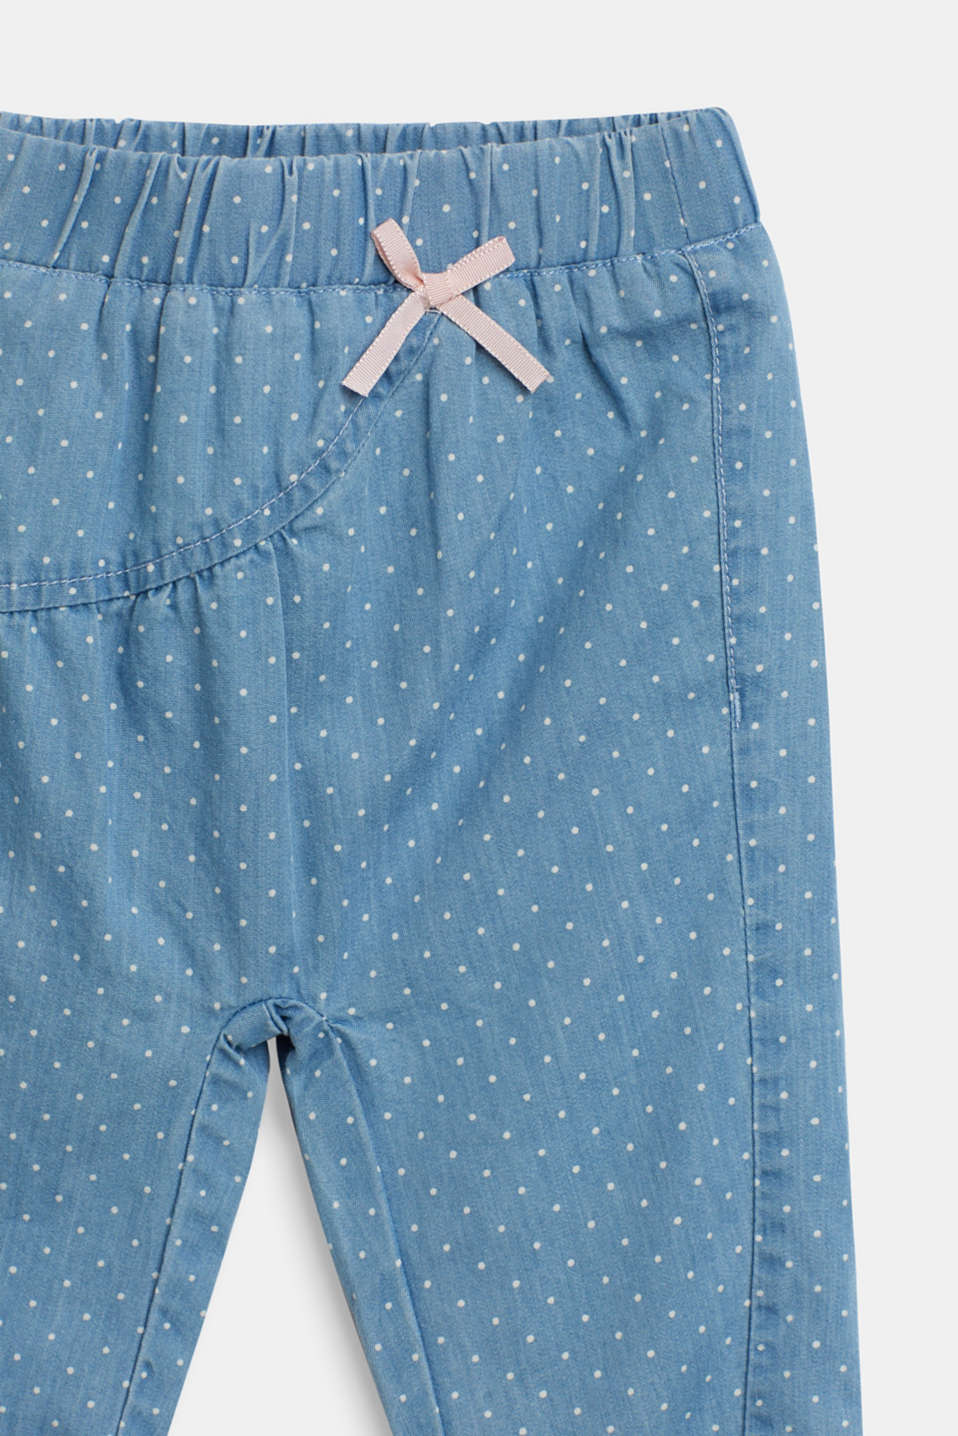 Denim-effect polka dot trousers, LCBLUE LIGHT WAS, detail image number 2